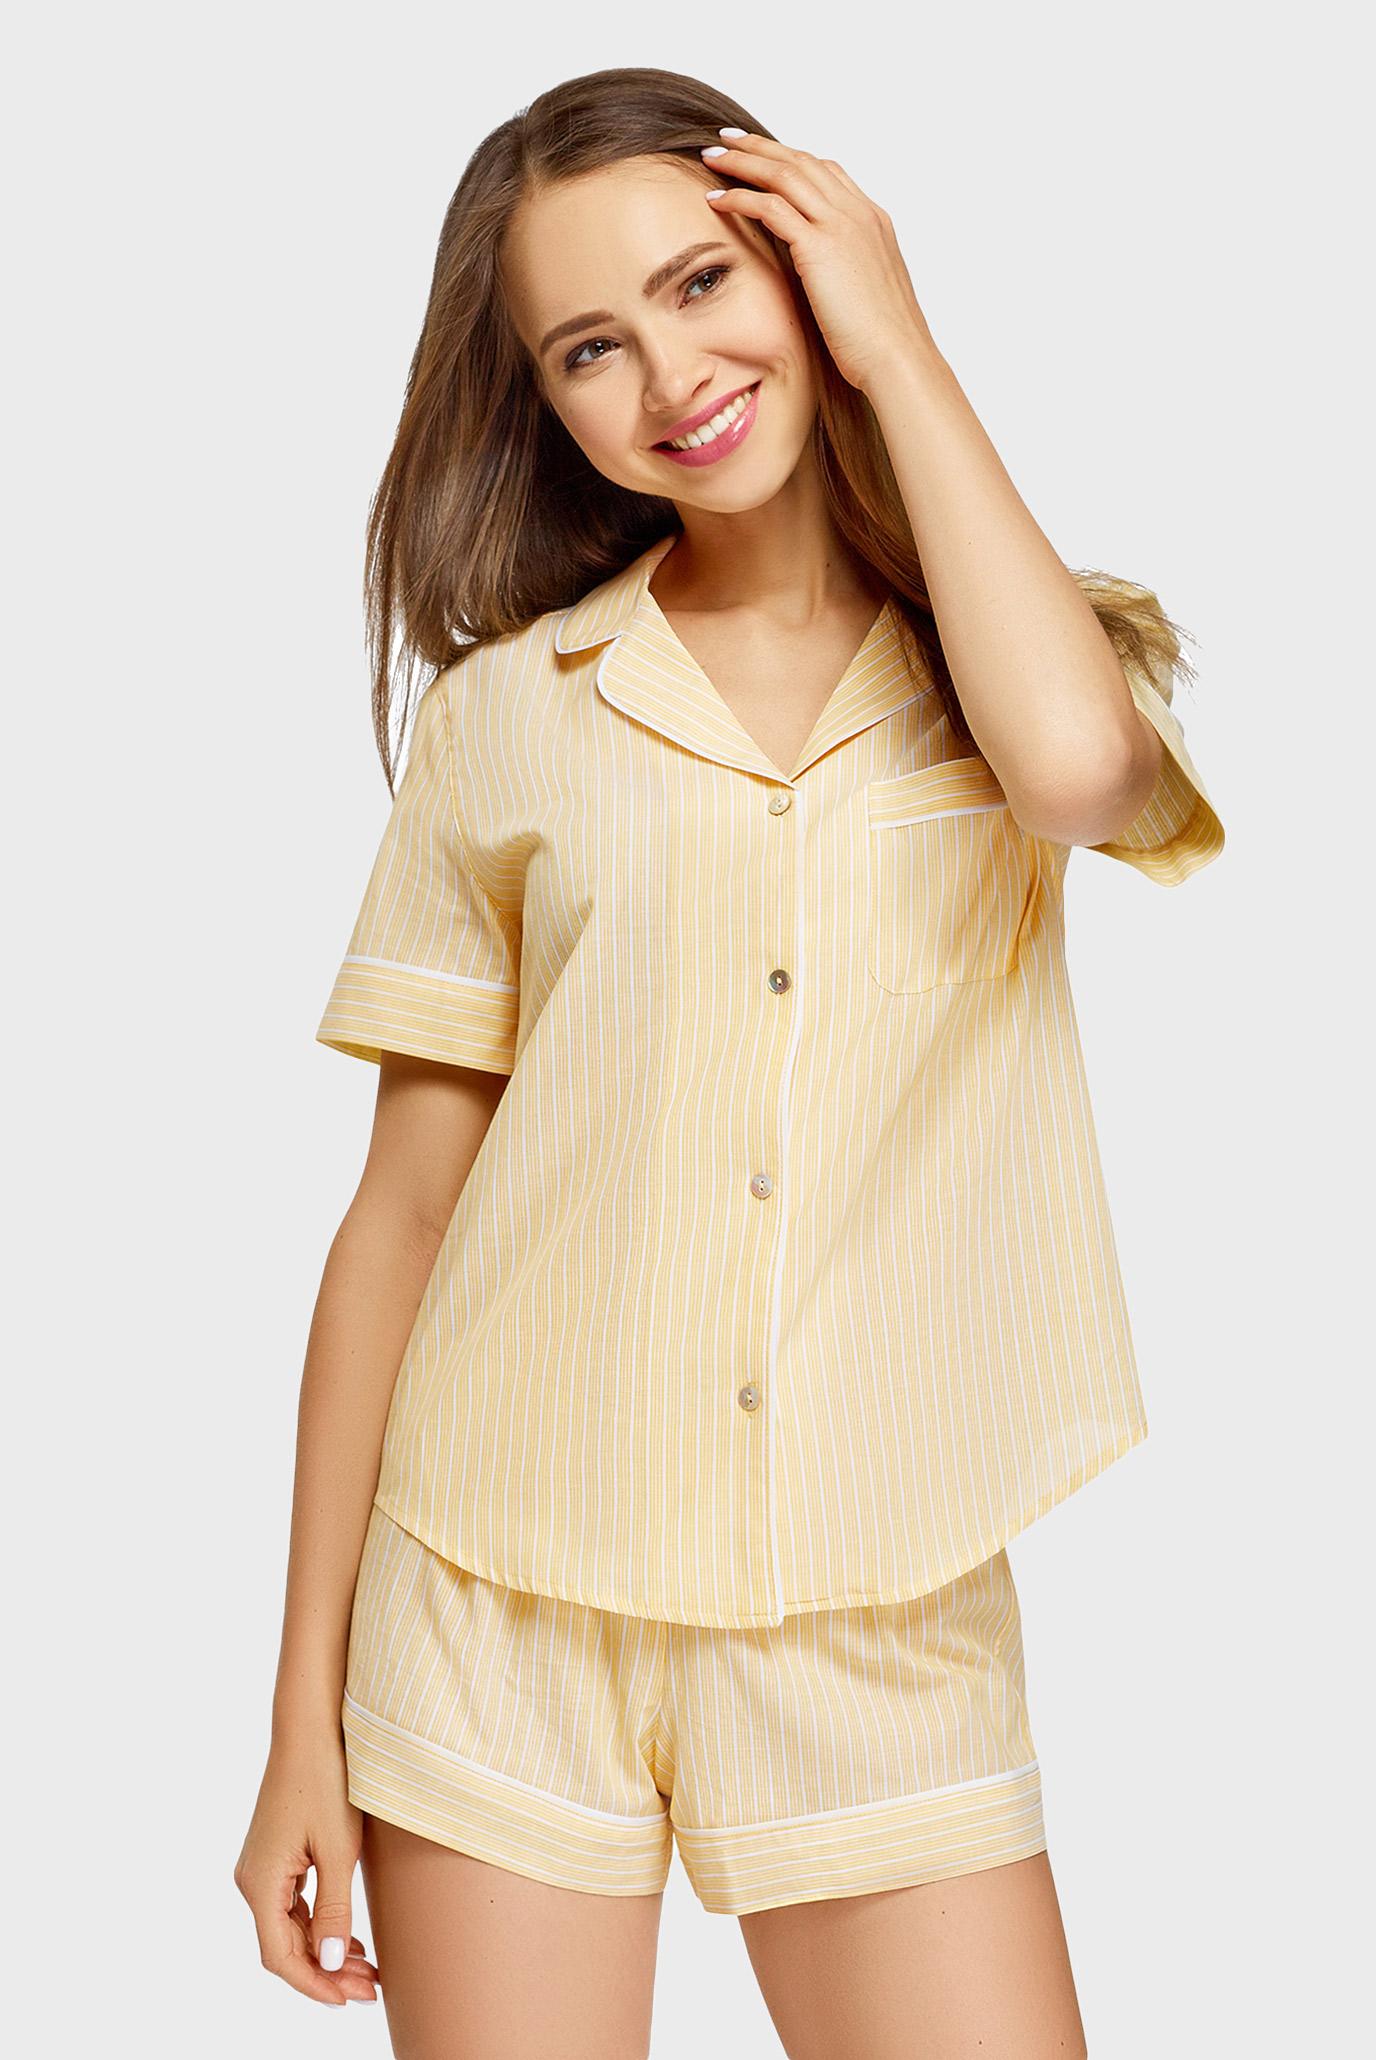 Женская желтая рубашка 1